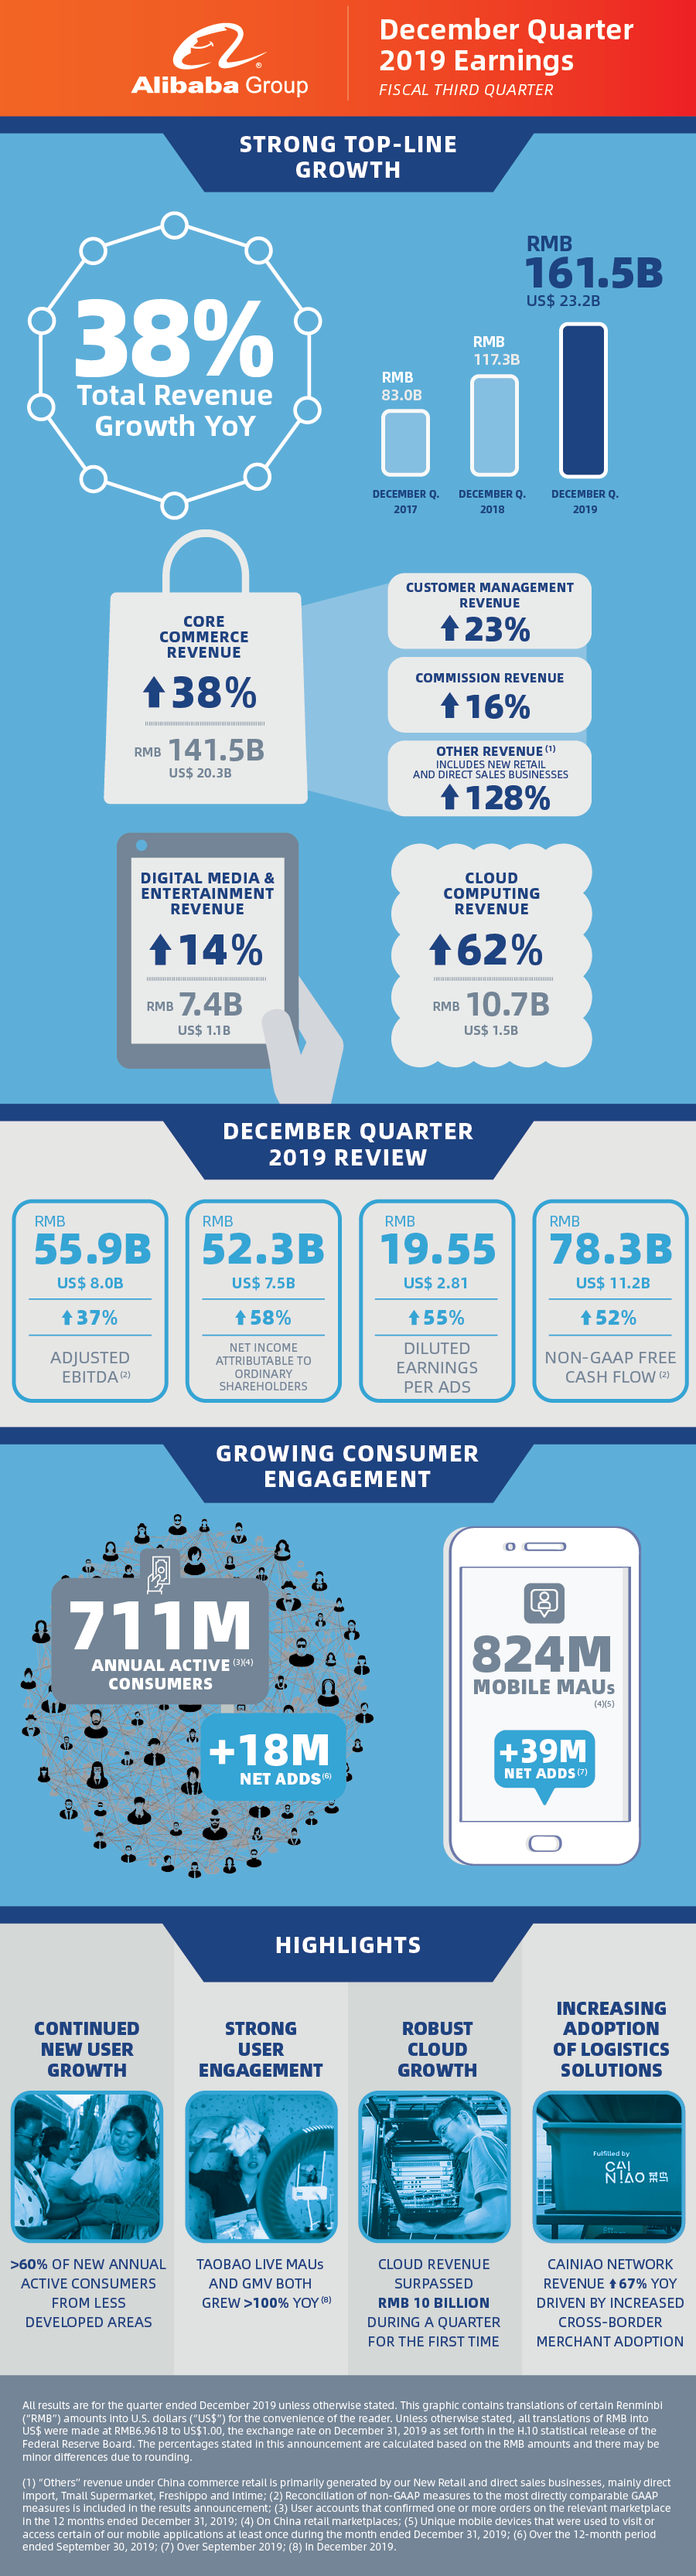 BABA-December-2019-Earnings-Infographic